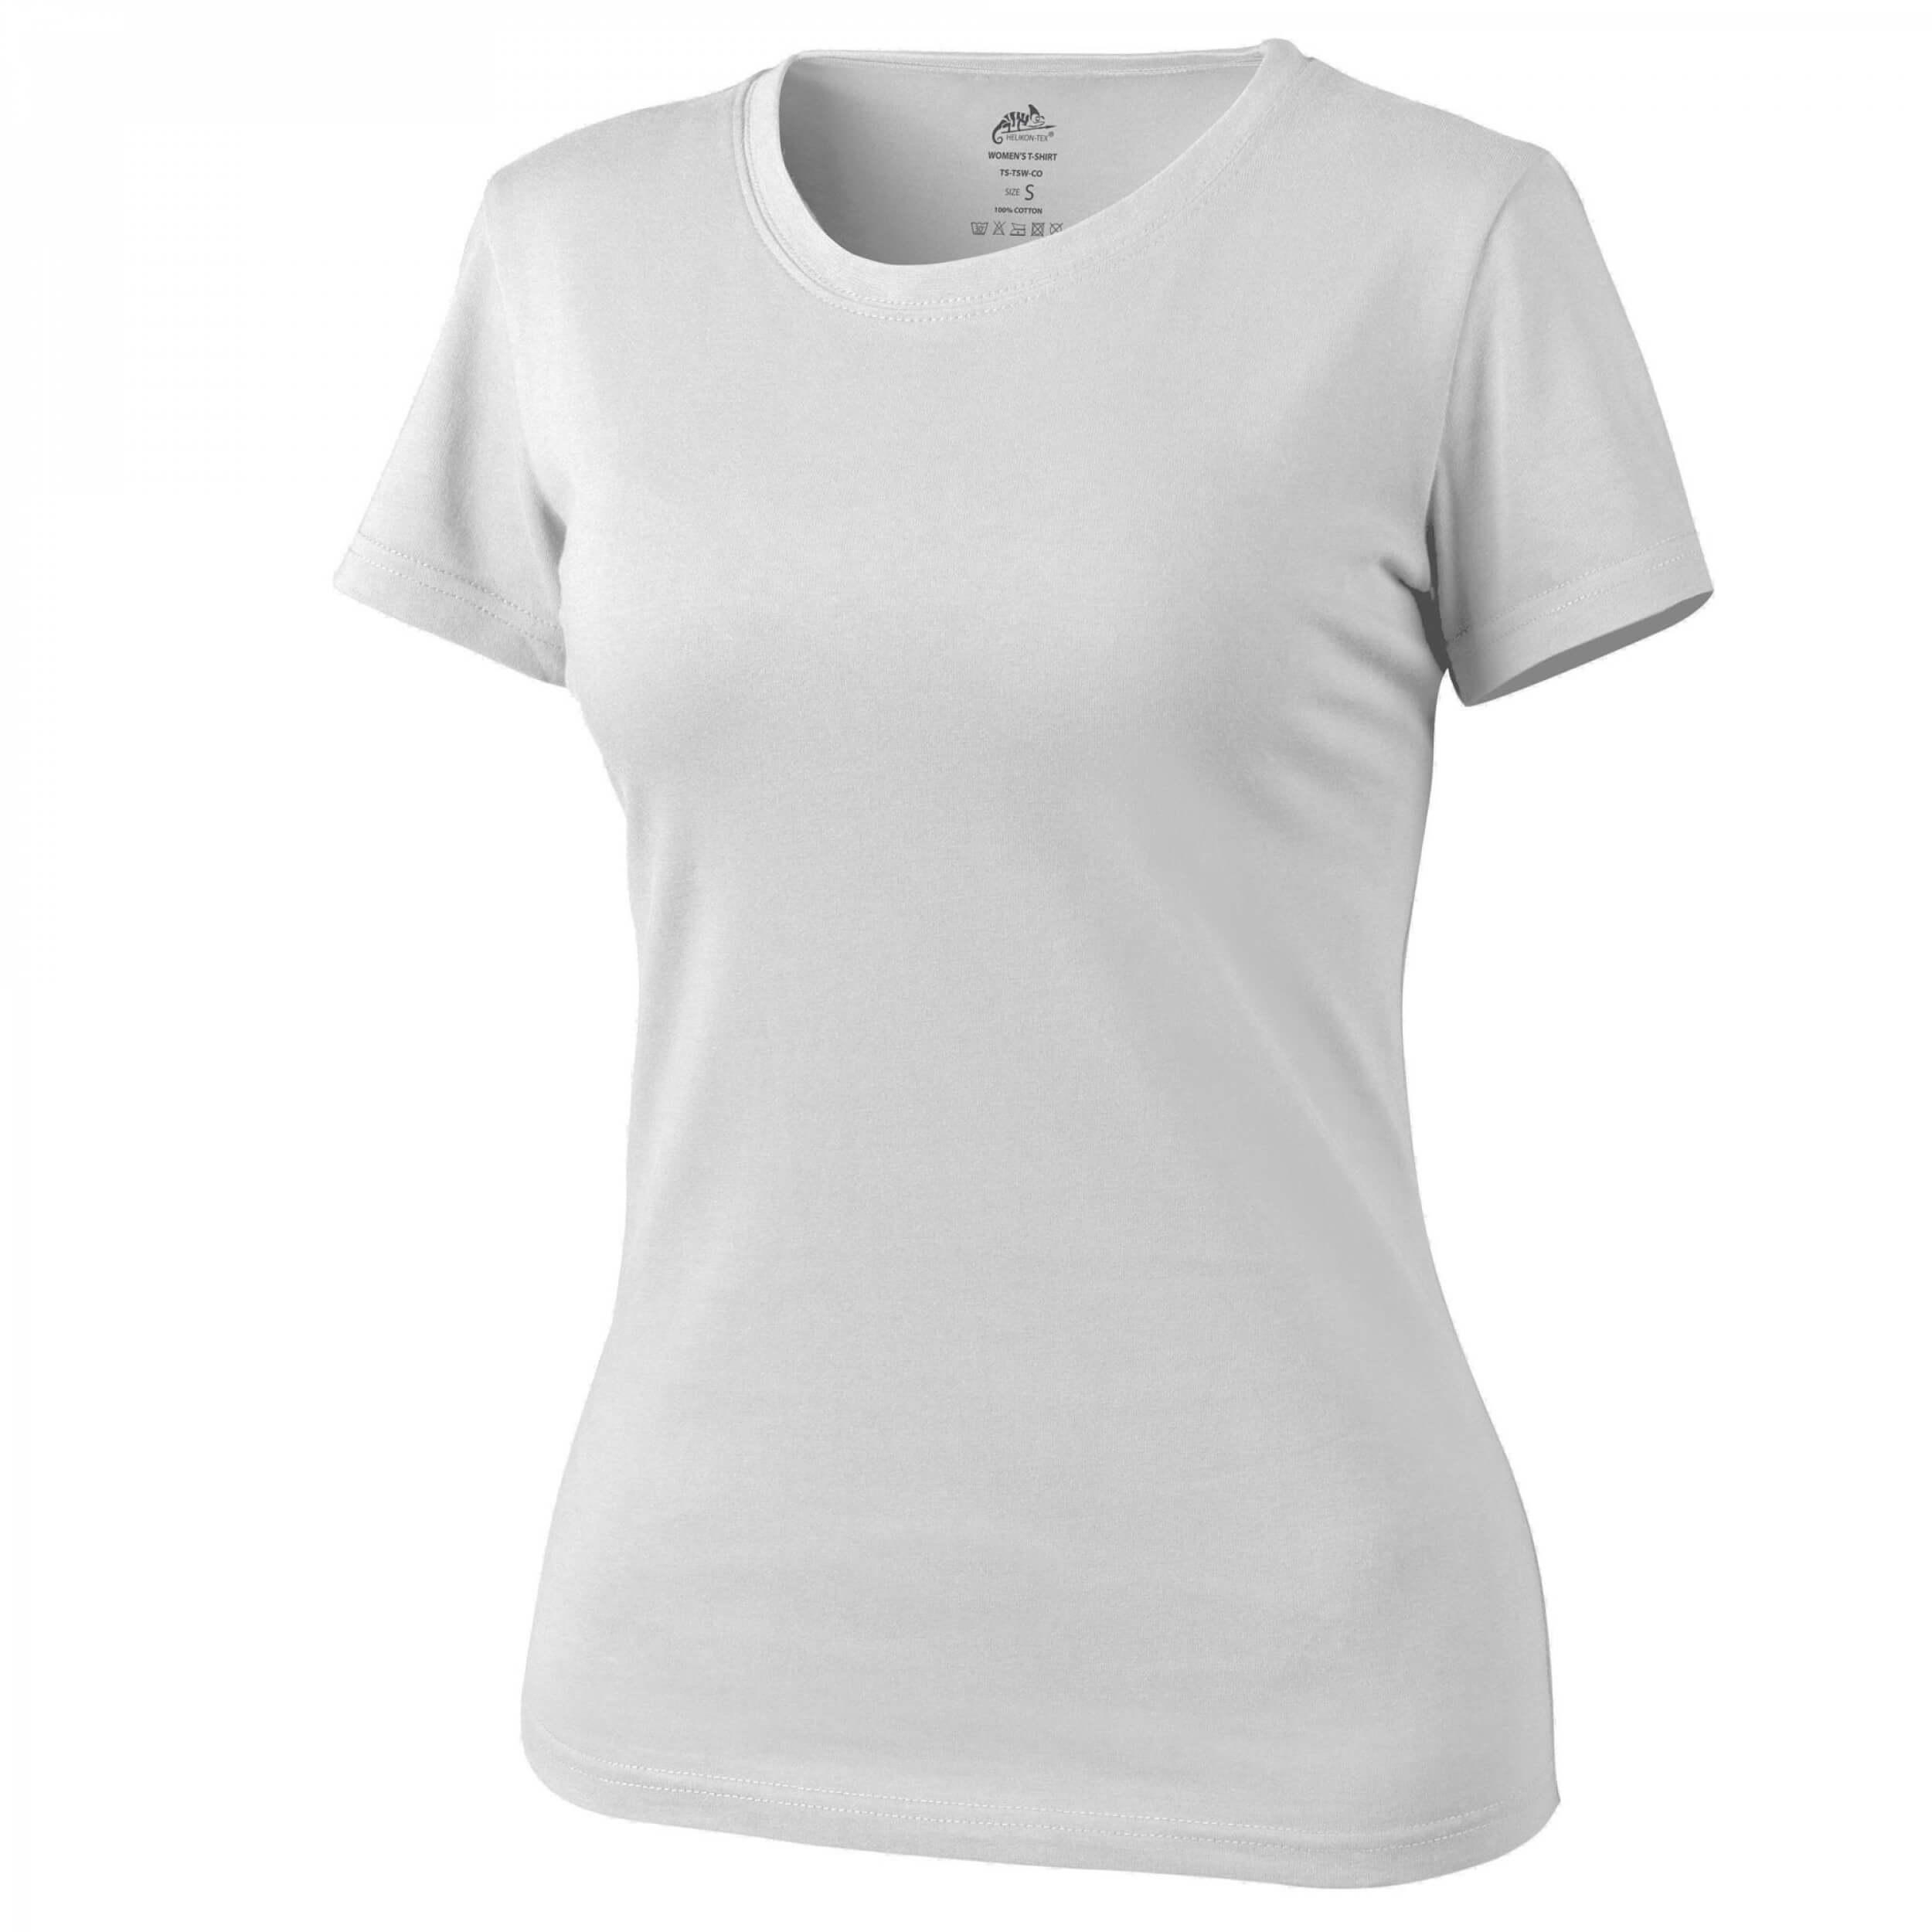 Helikon-Tex Womens T-Shirt Cotton - White